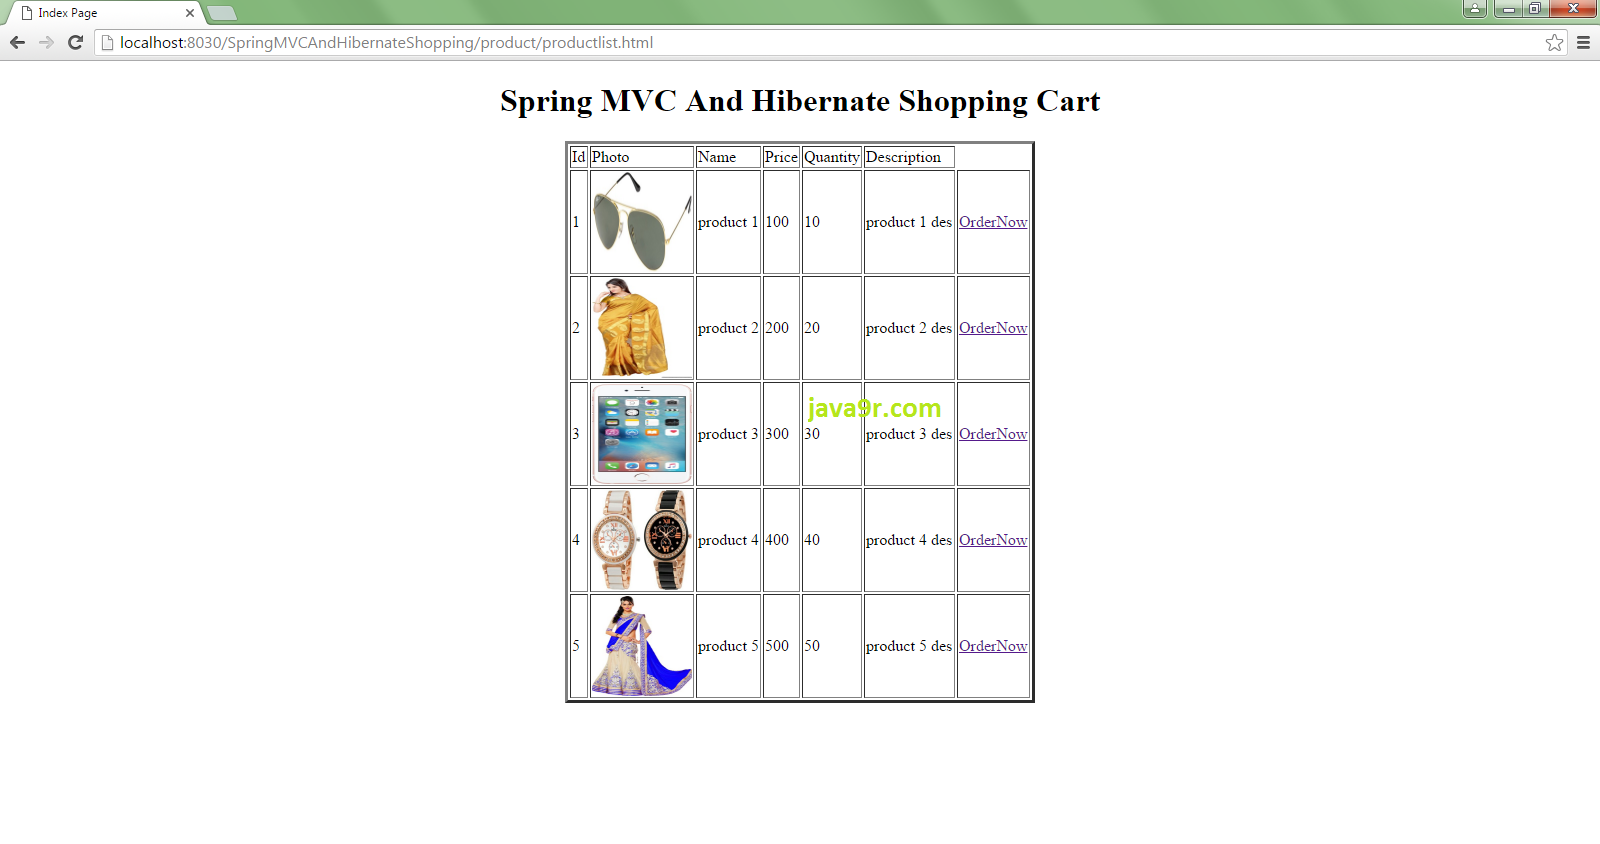 Java9R: Spring MVC And Hibernate Shopping Cart